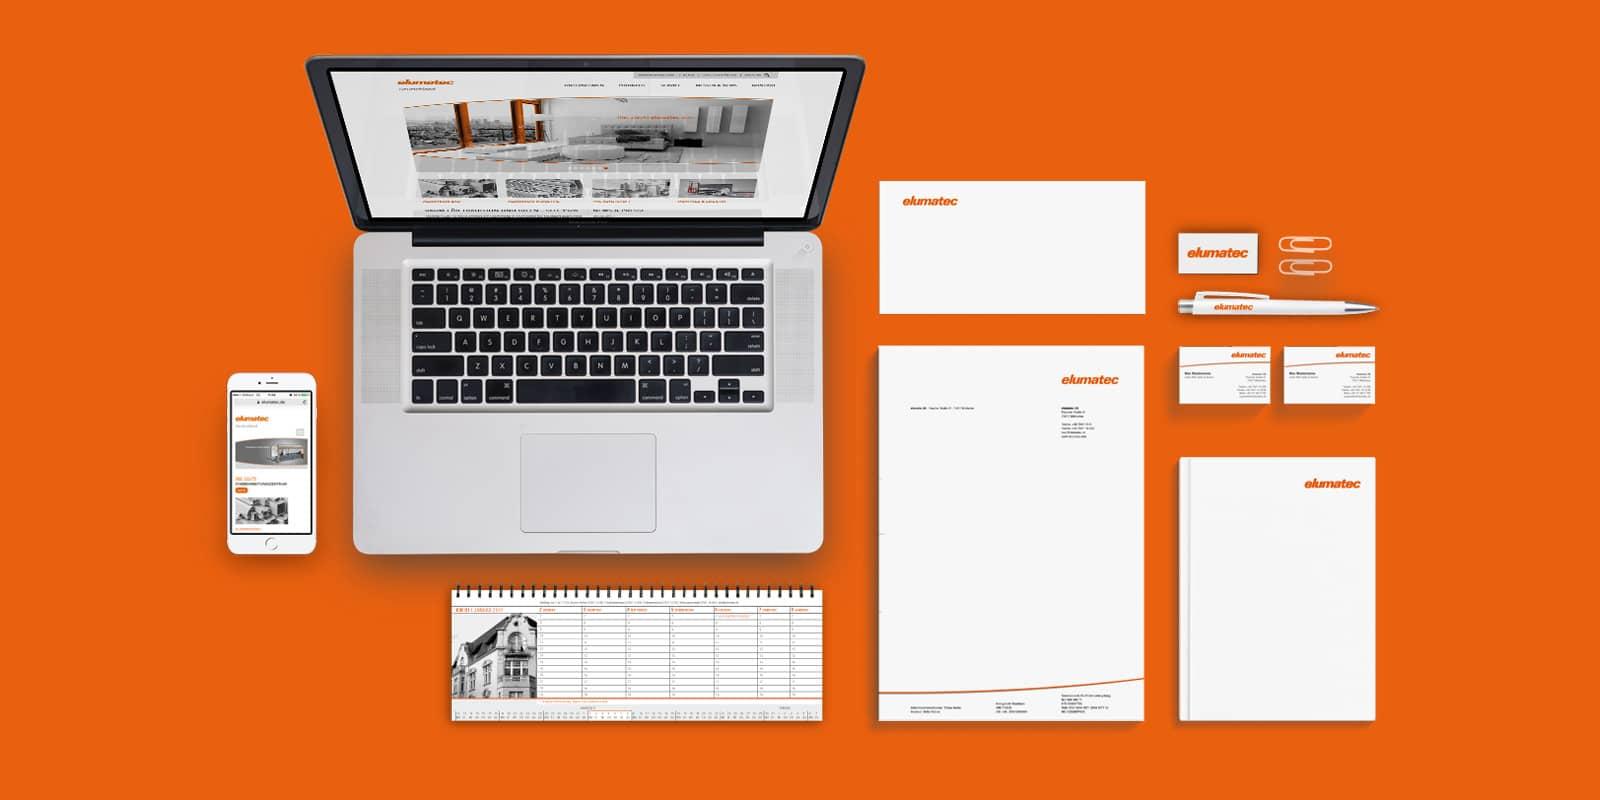 elumatec – Corporate Design